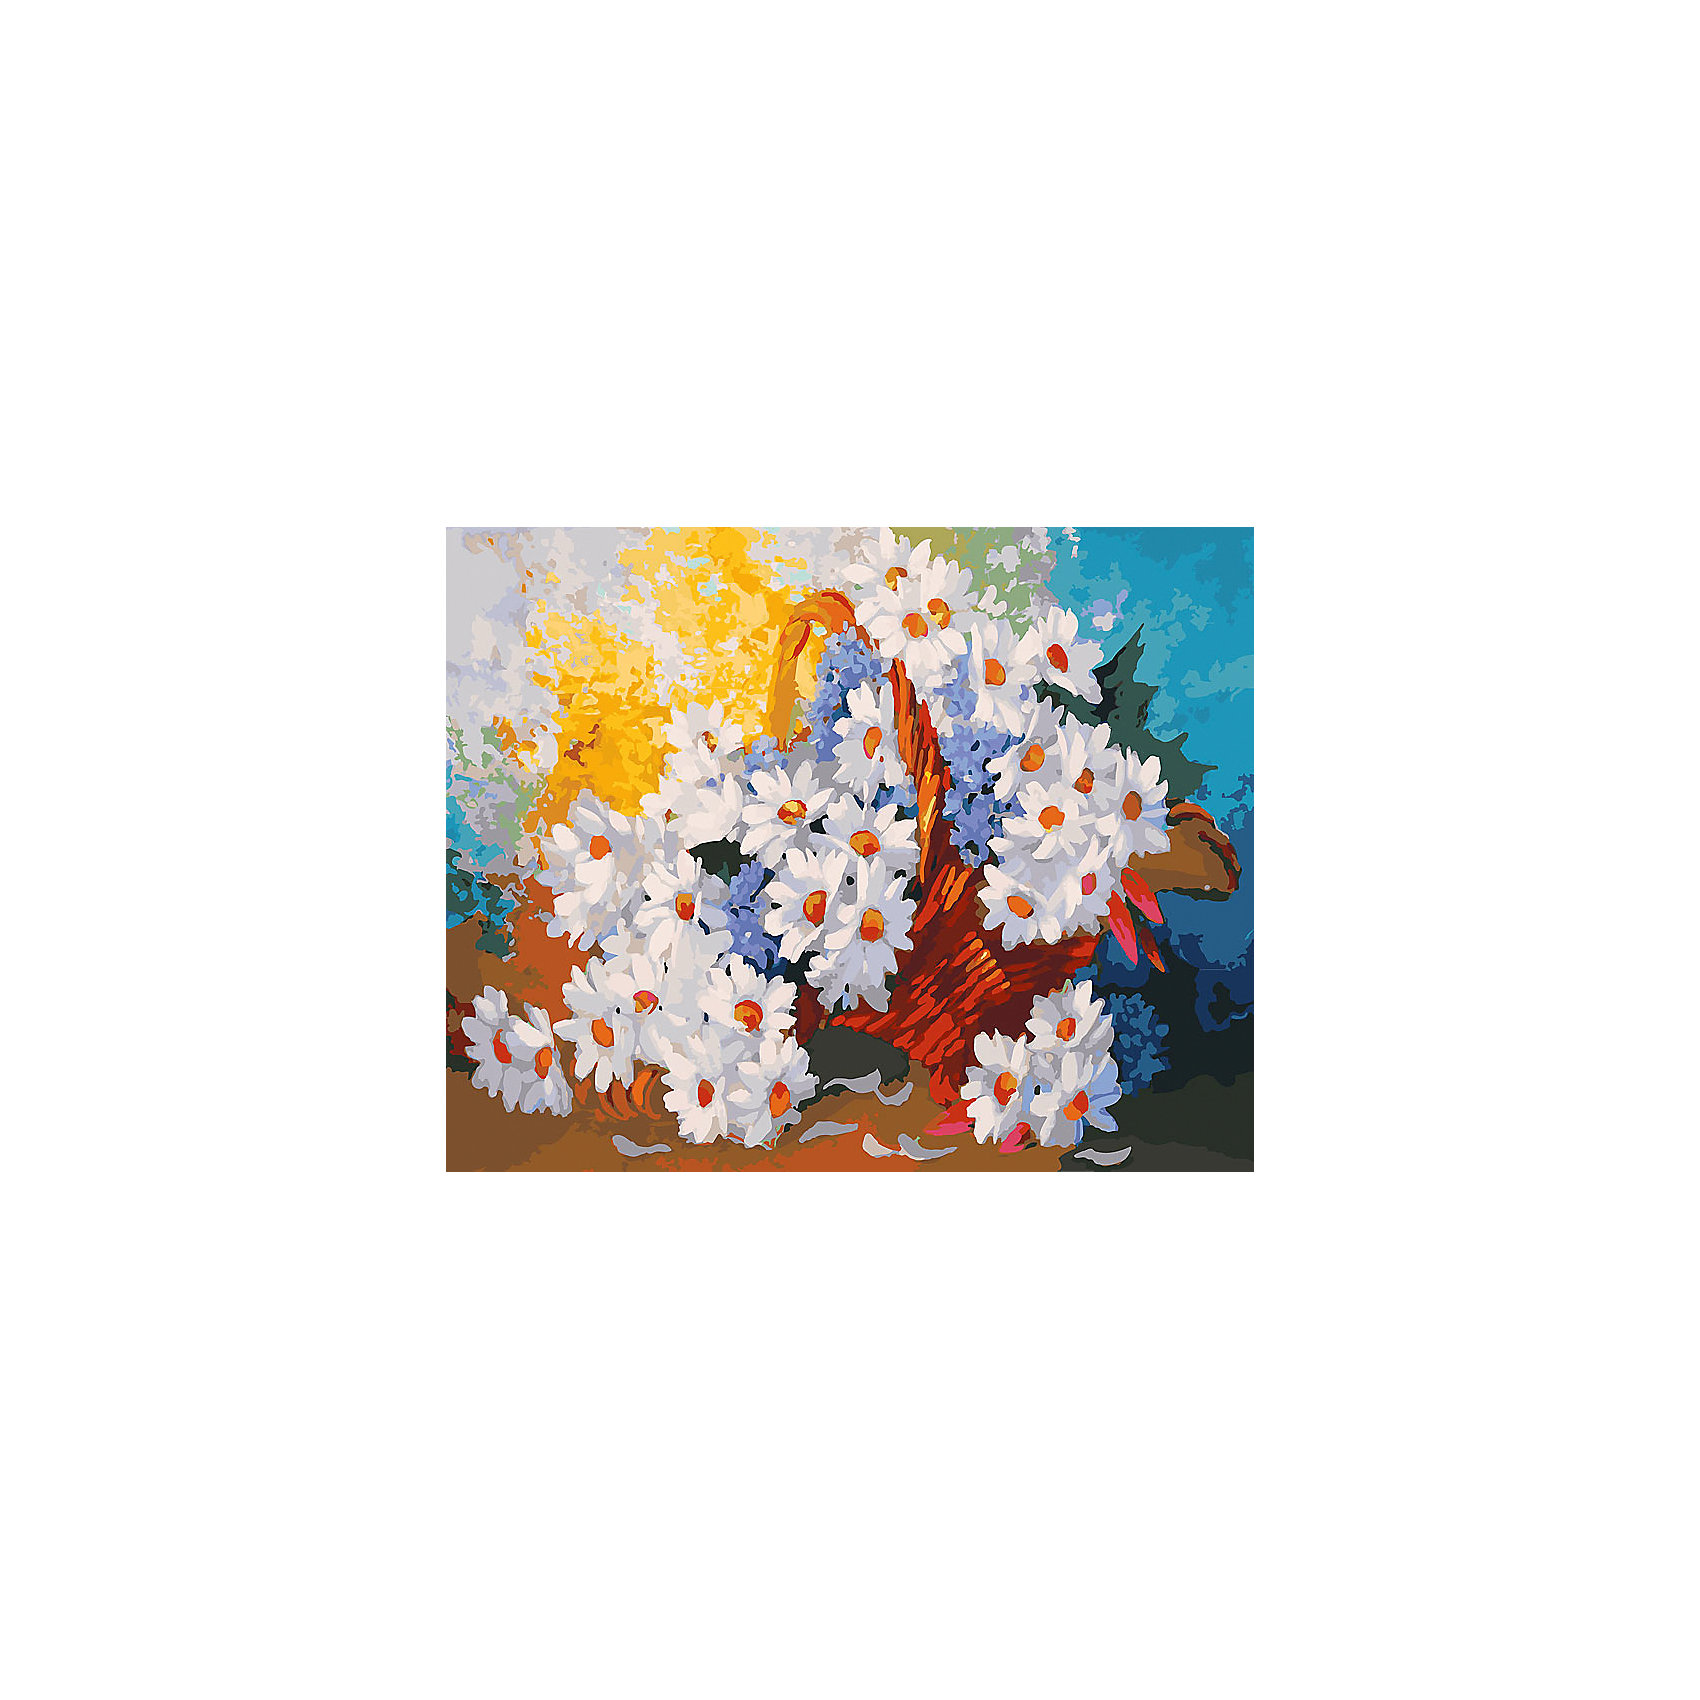 Белоснежка Живопись на холсте 40*50 см Корзинка с ромашками